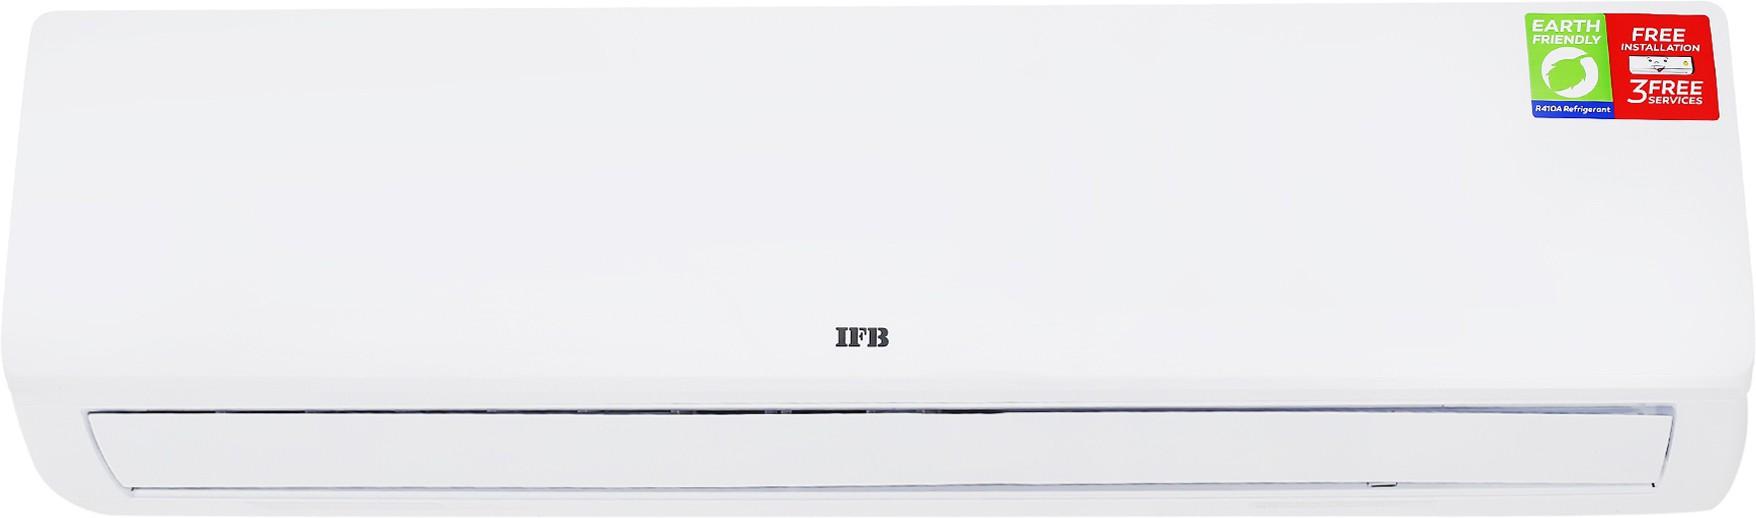 IFB IAFS24XA3T4C 2 Ton 3 Star BEE Rating 2018 Split AC Image